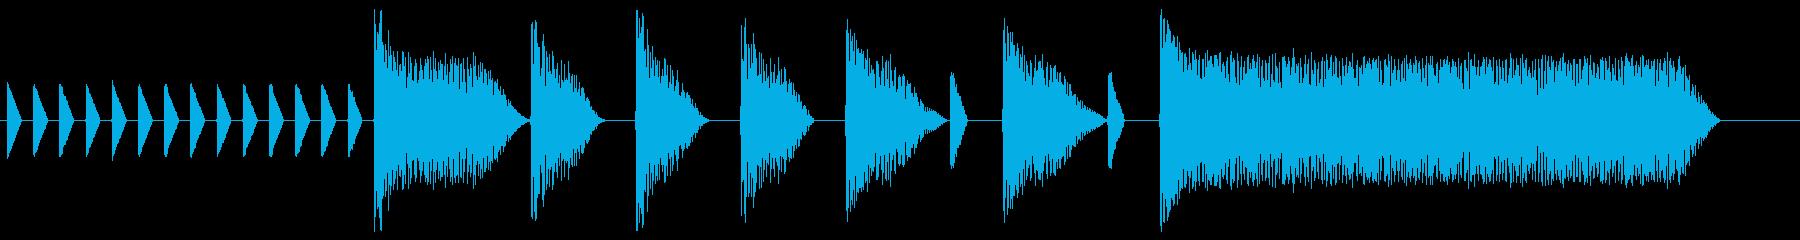 8bitジングル#10スタート&クリアの再生済みの波形